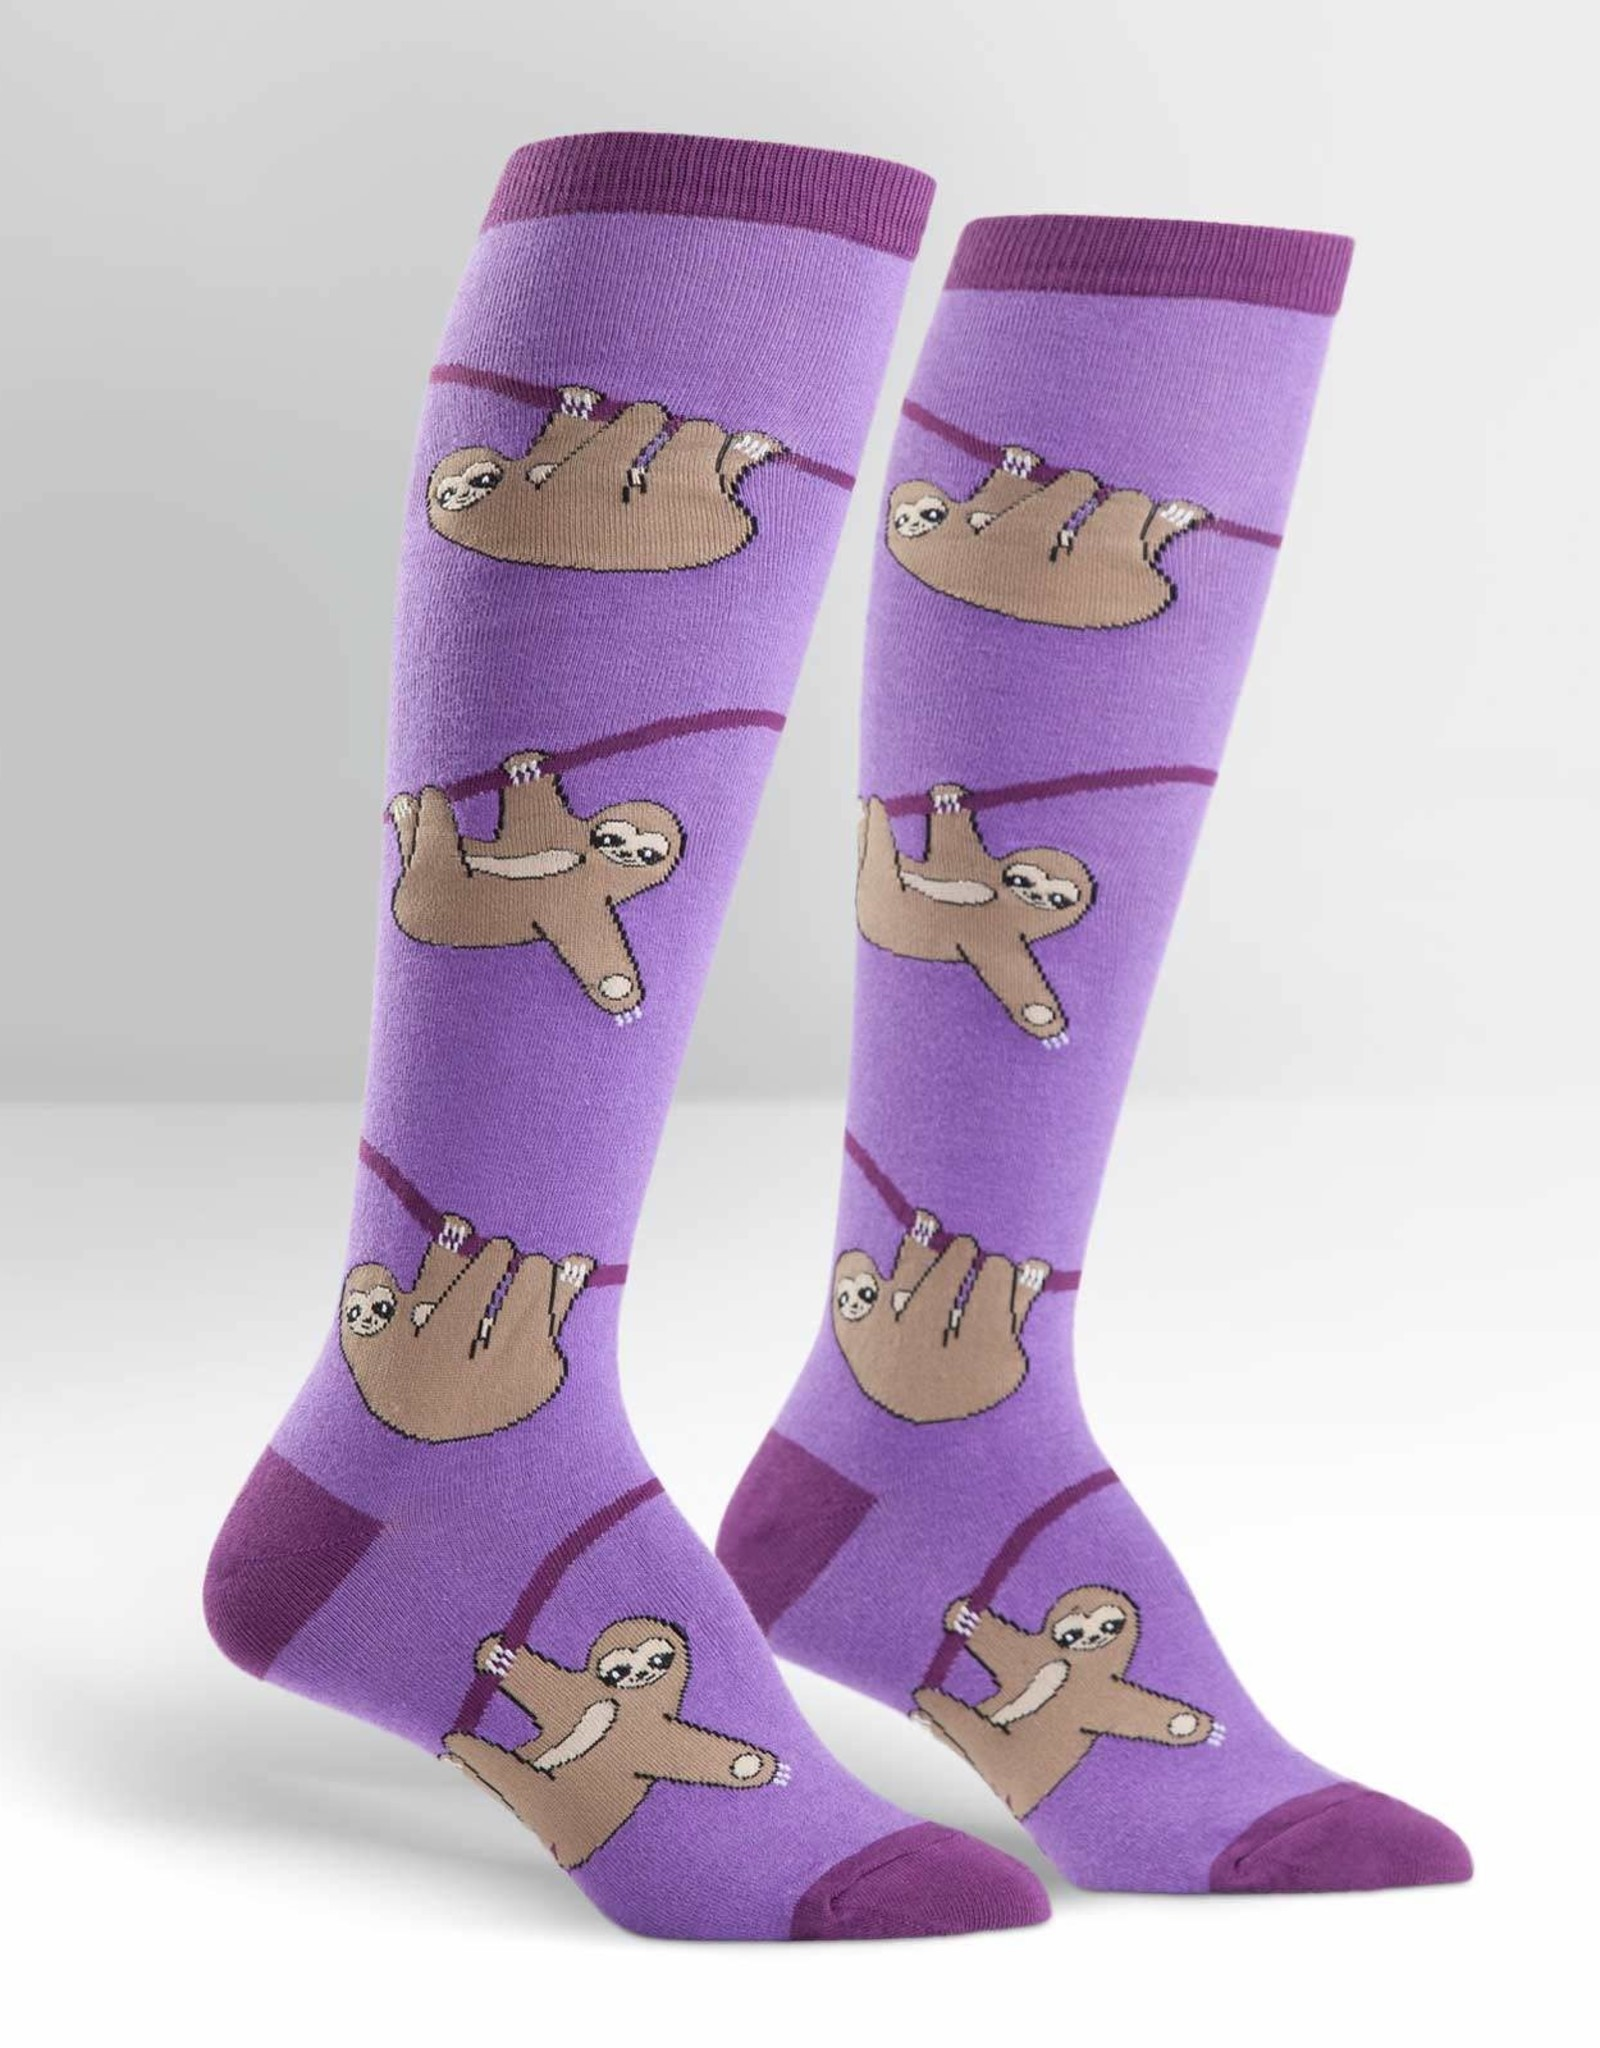 Sock It To Me Knee High: Sloth